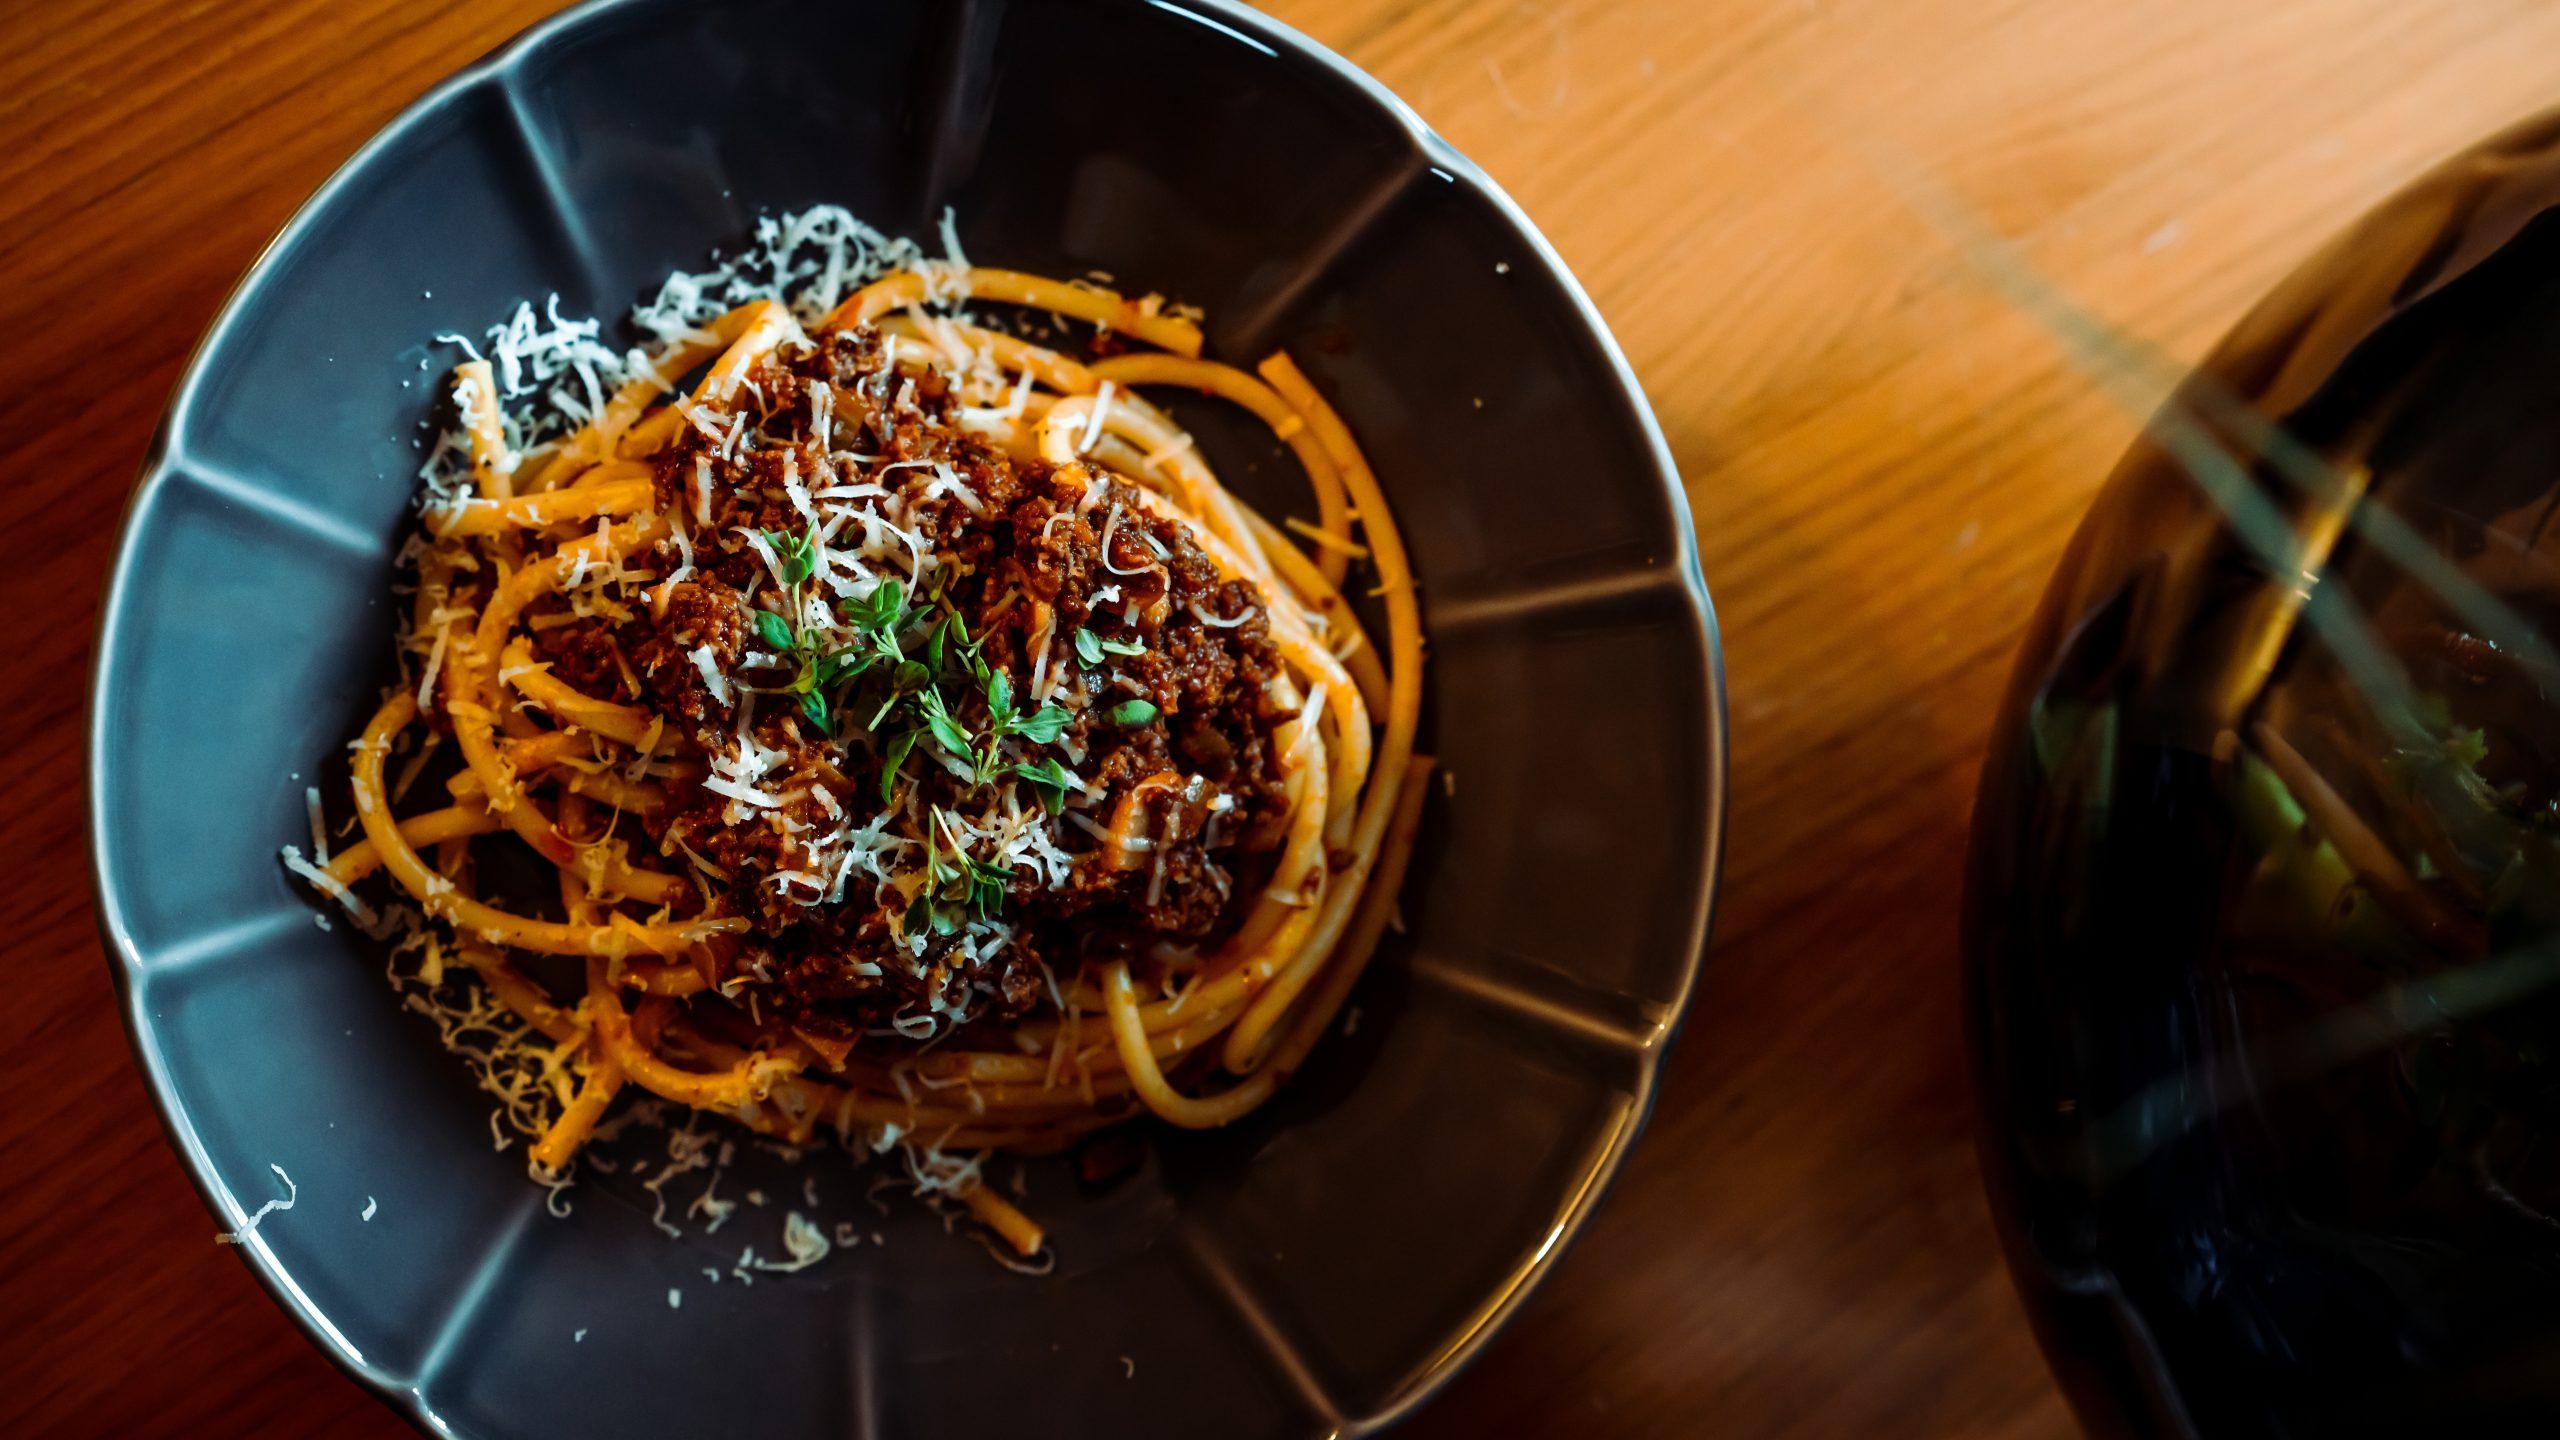 Pasta Bolognese for dinner, what else do you need?